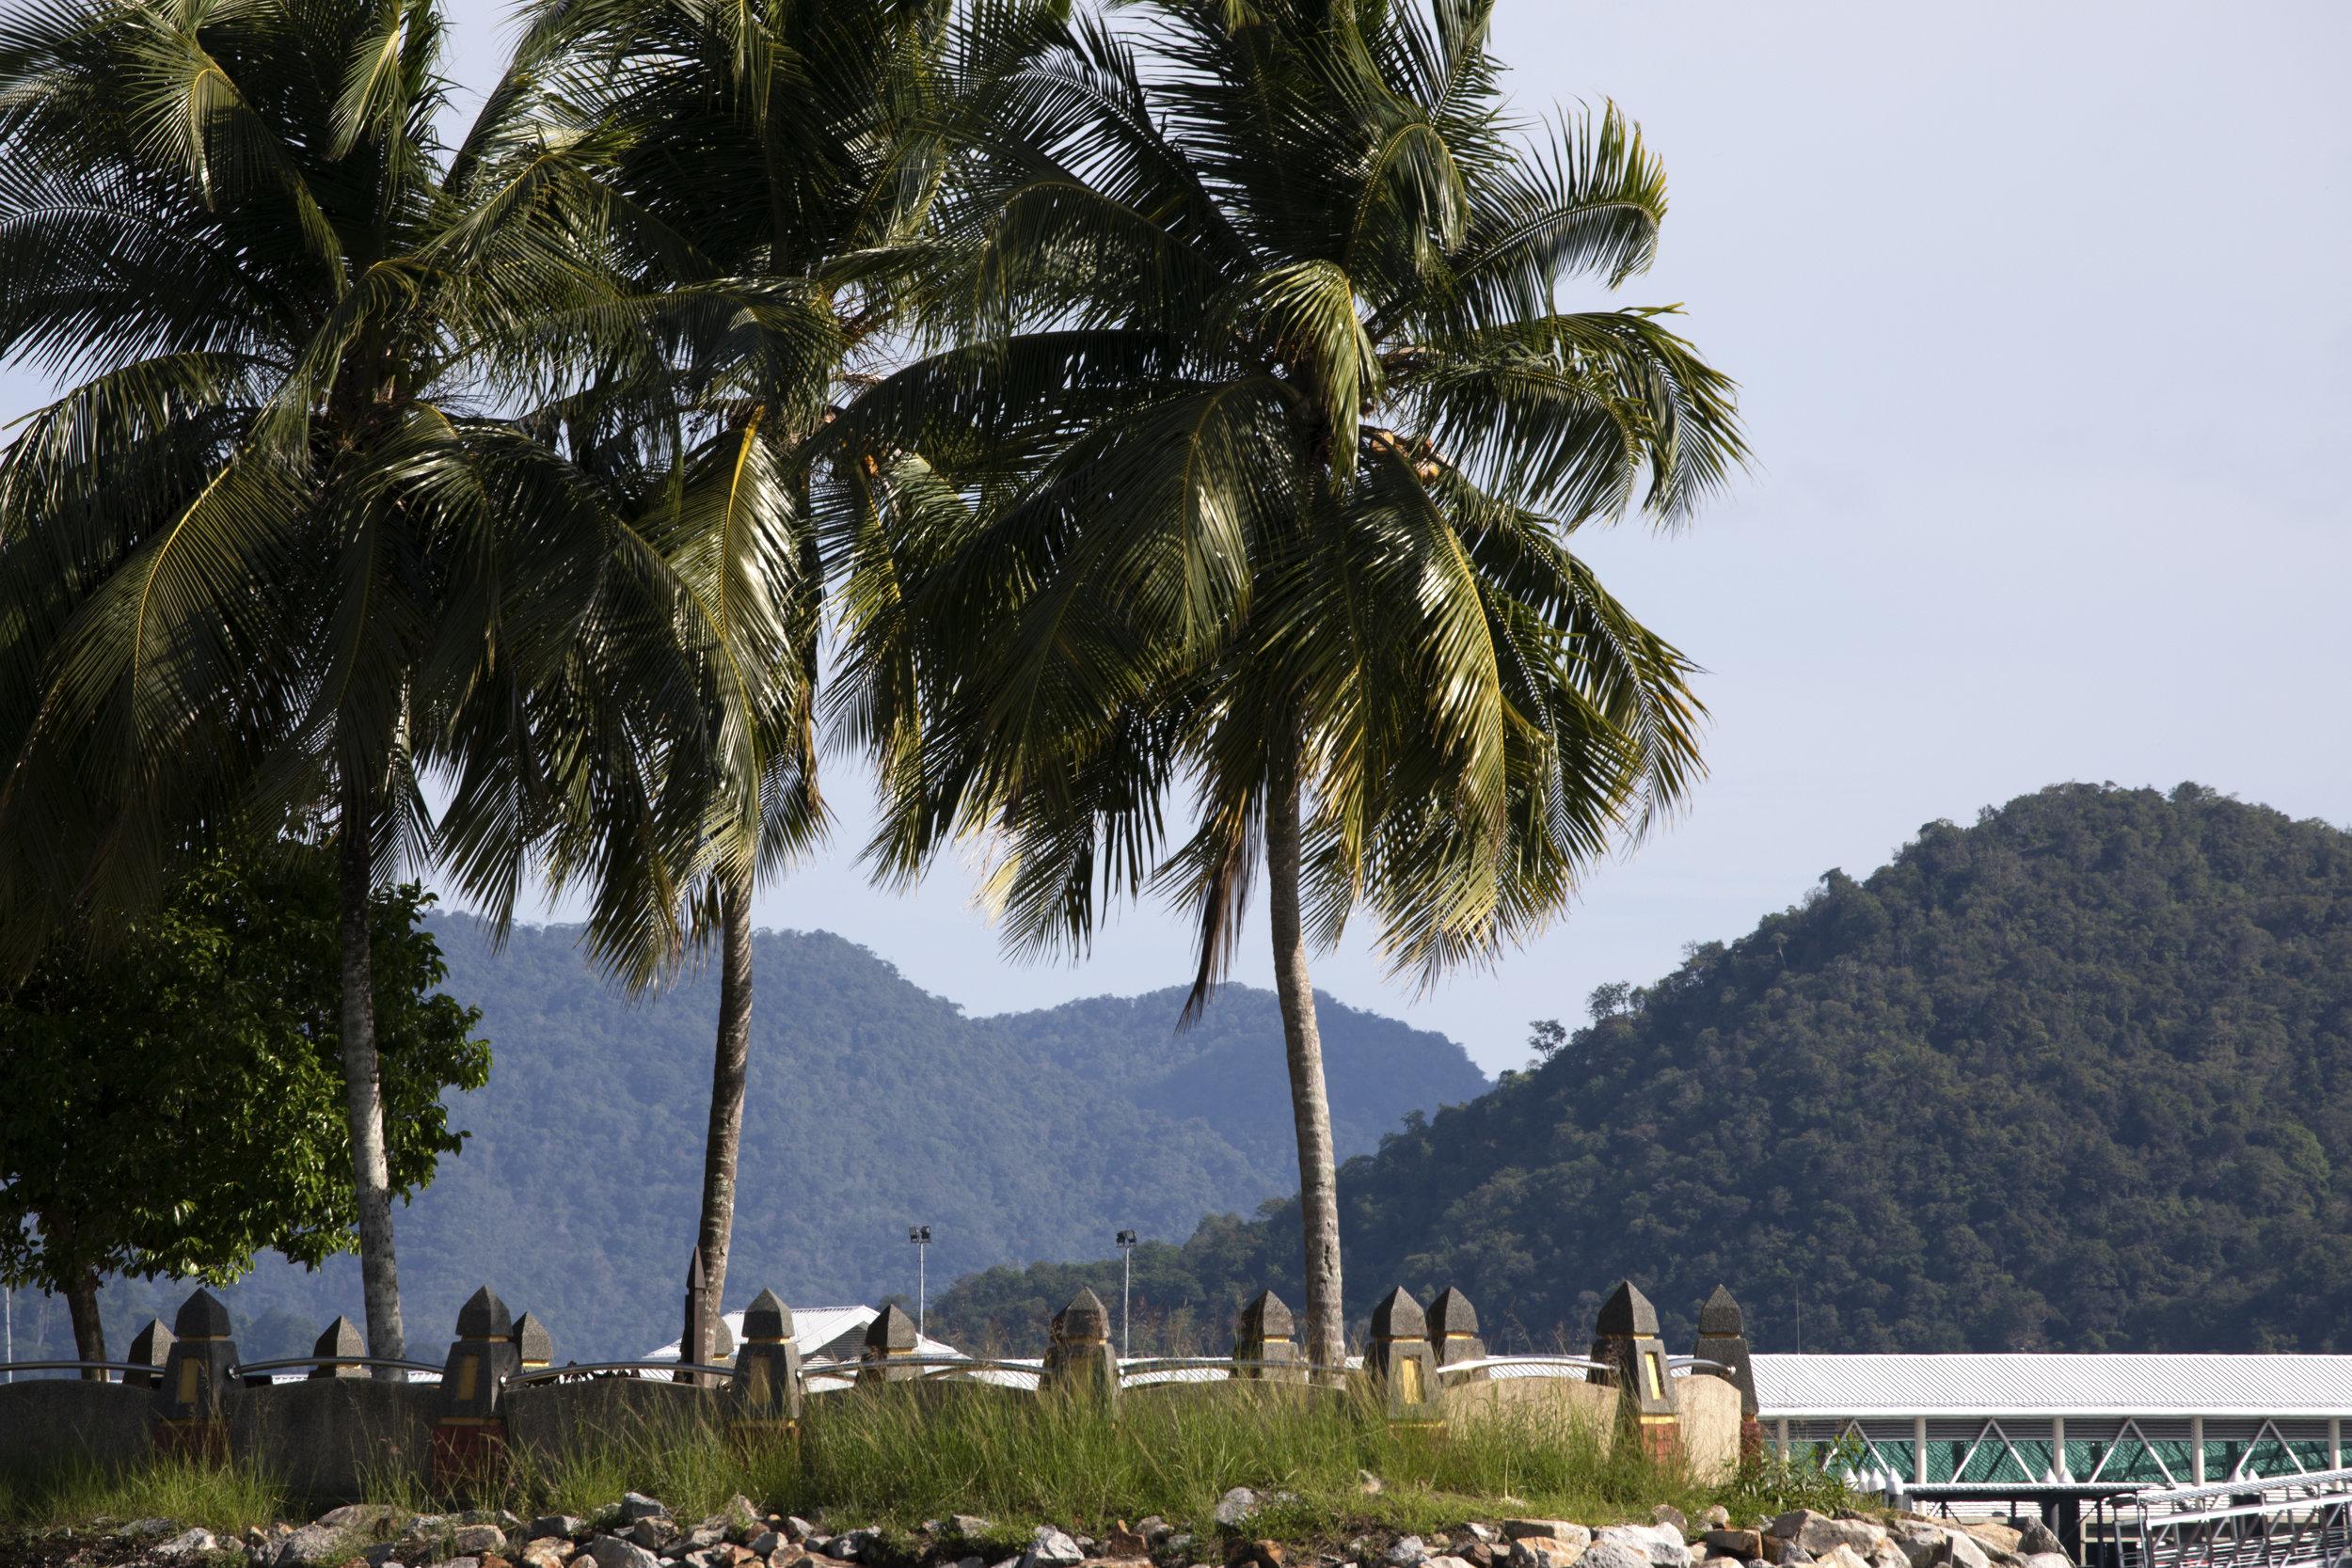 Langkawi Palm Trees, Malaysia 2019